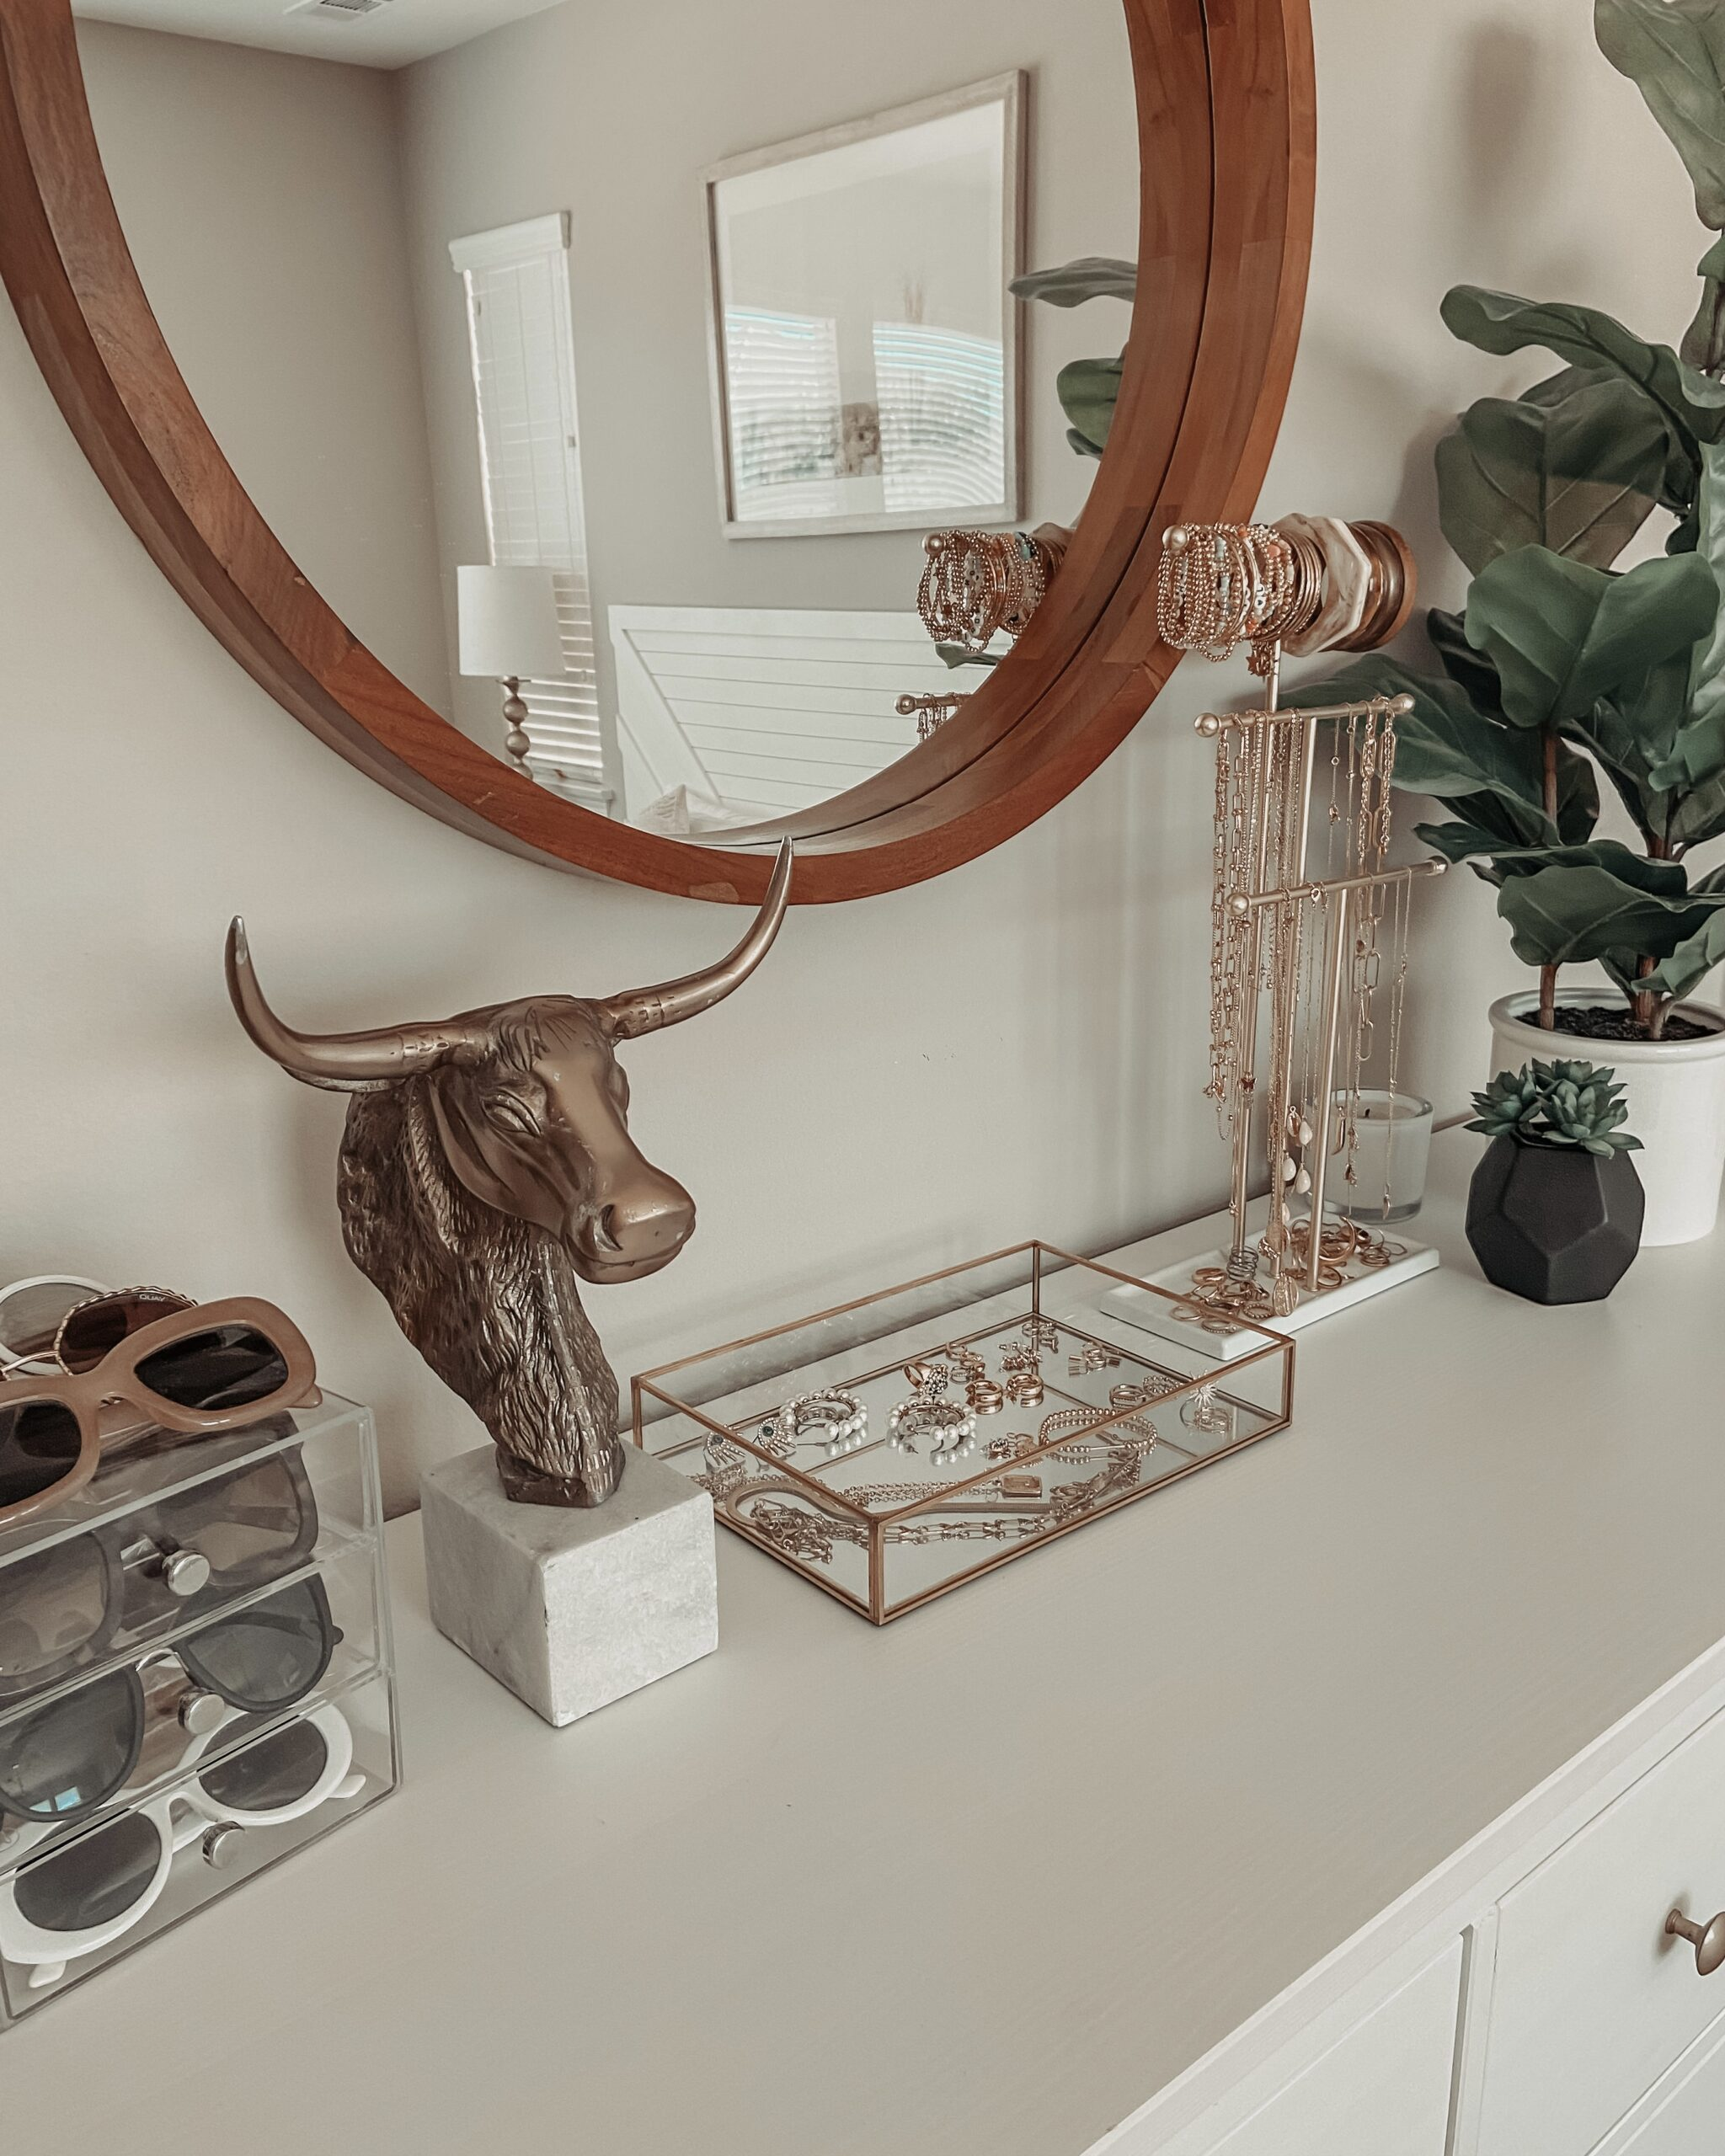 FAVORITE ORGANIZATIONAL FINDS- Jaclyn De Leon Style: Sharing all my favorite organizational pieces to help you get organized. Love my jewelry display + sunglasses organizer. Jewelry drawer organizers + bath caddy organizer + more